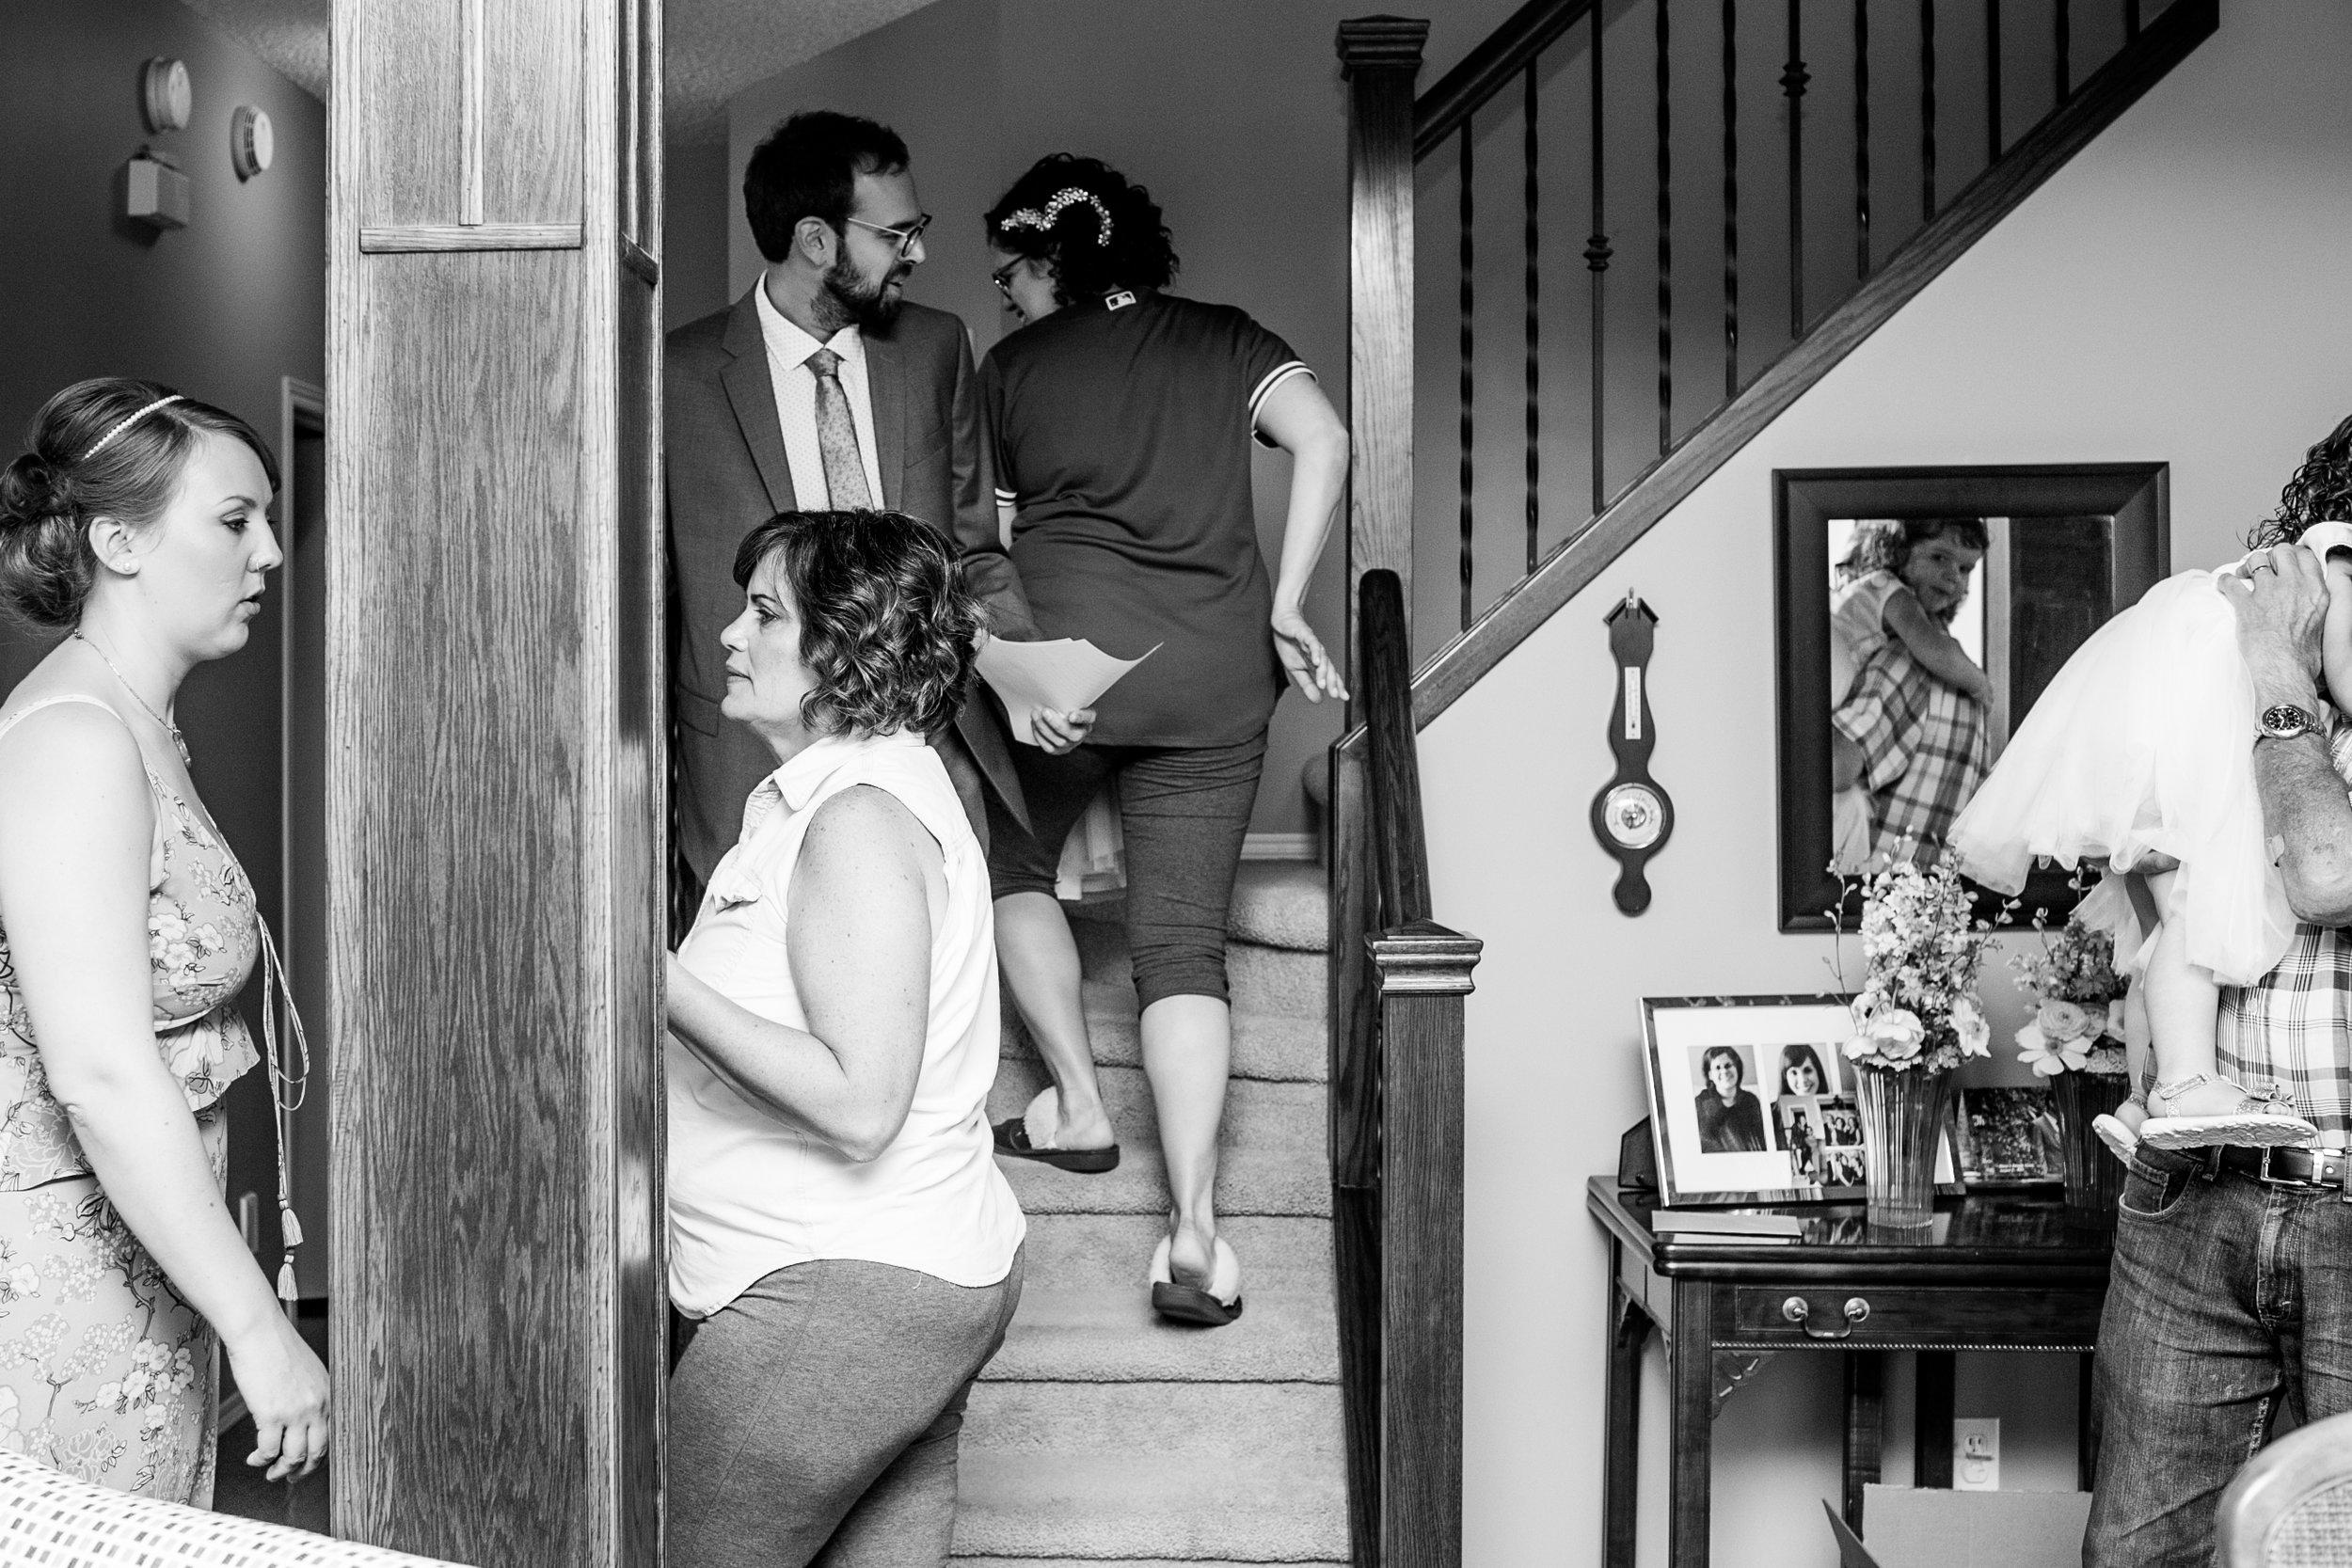 wedding pictures-57.jpg